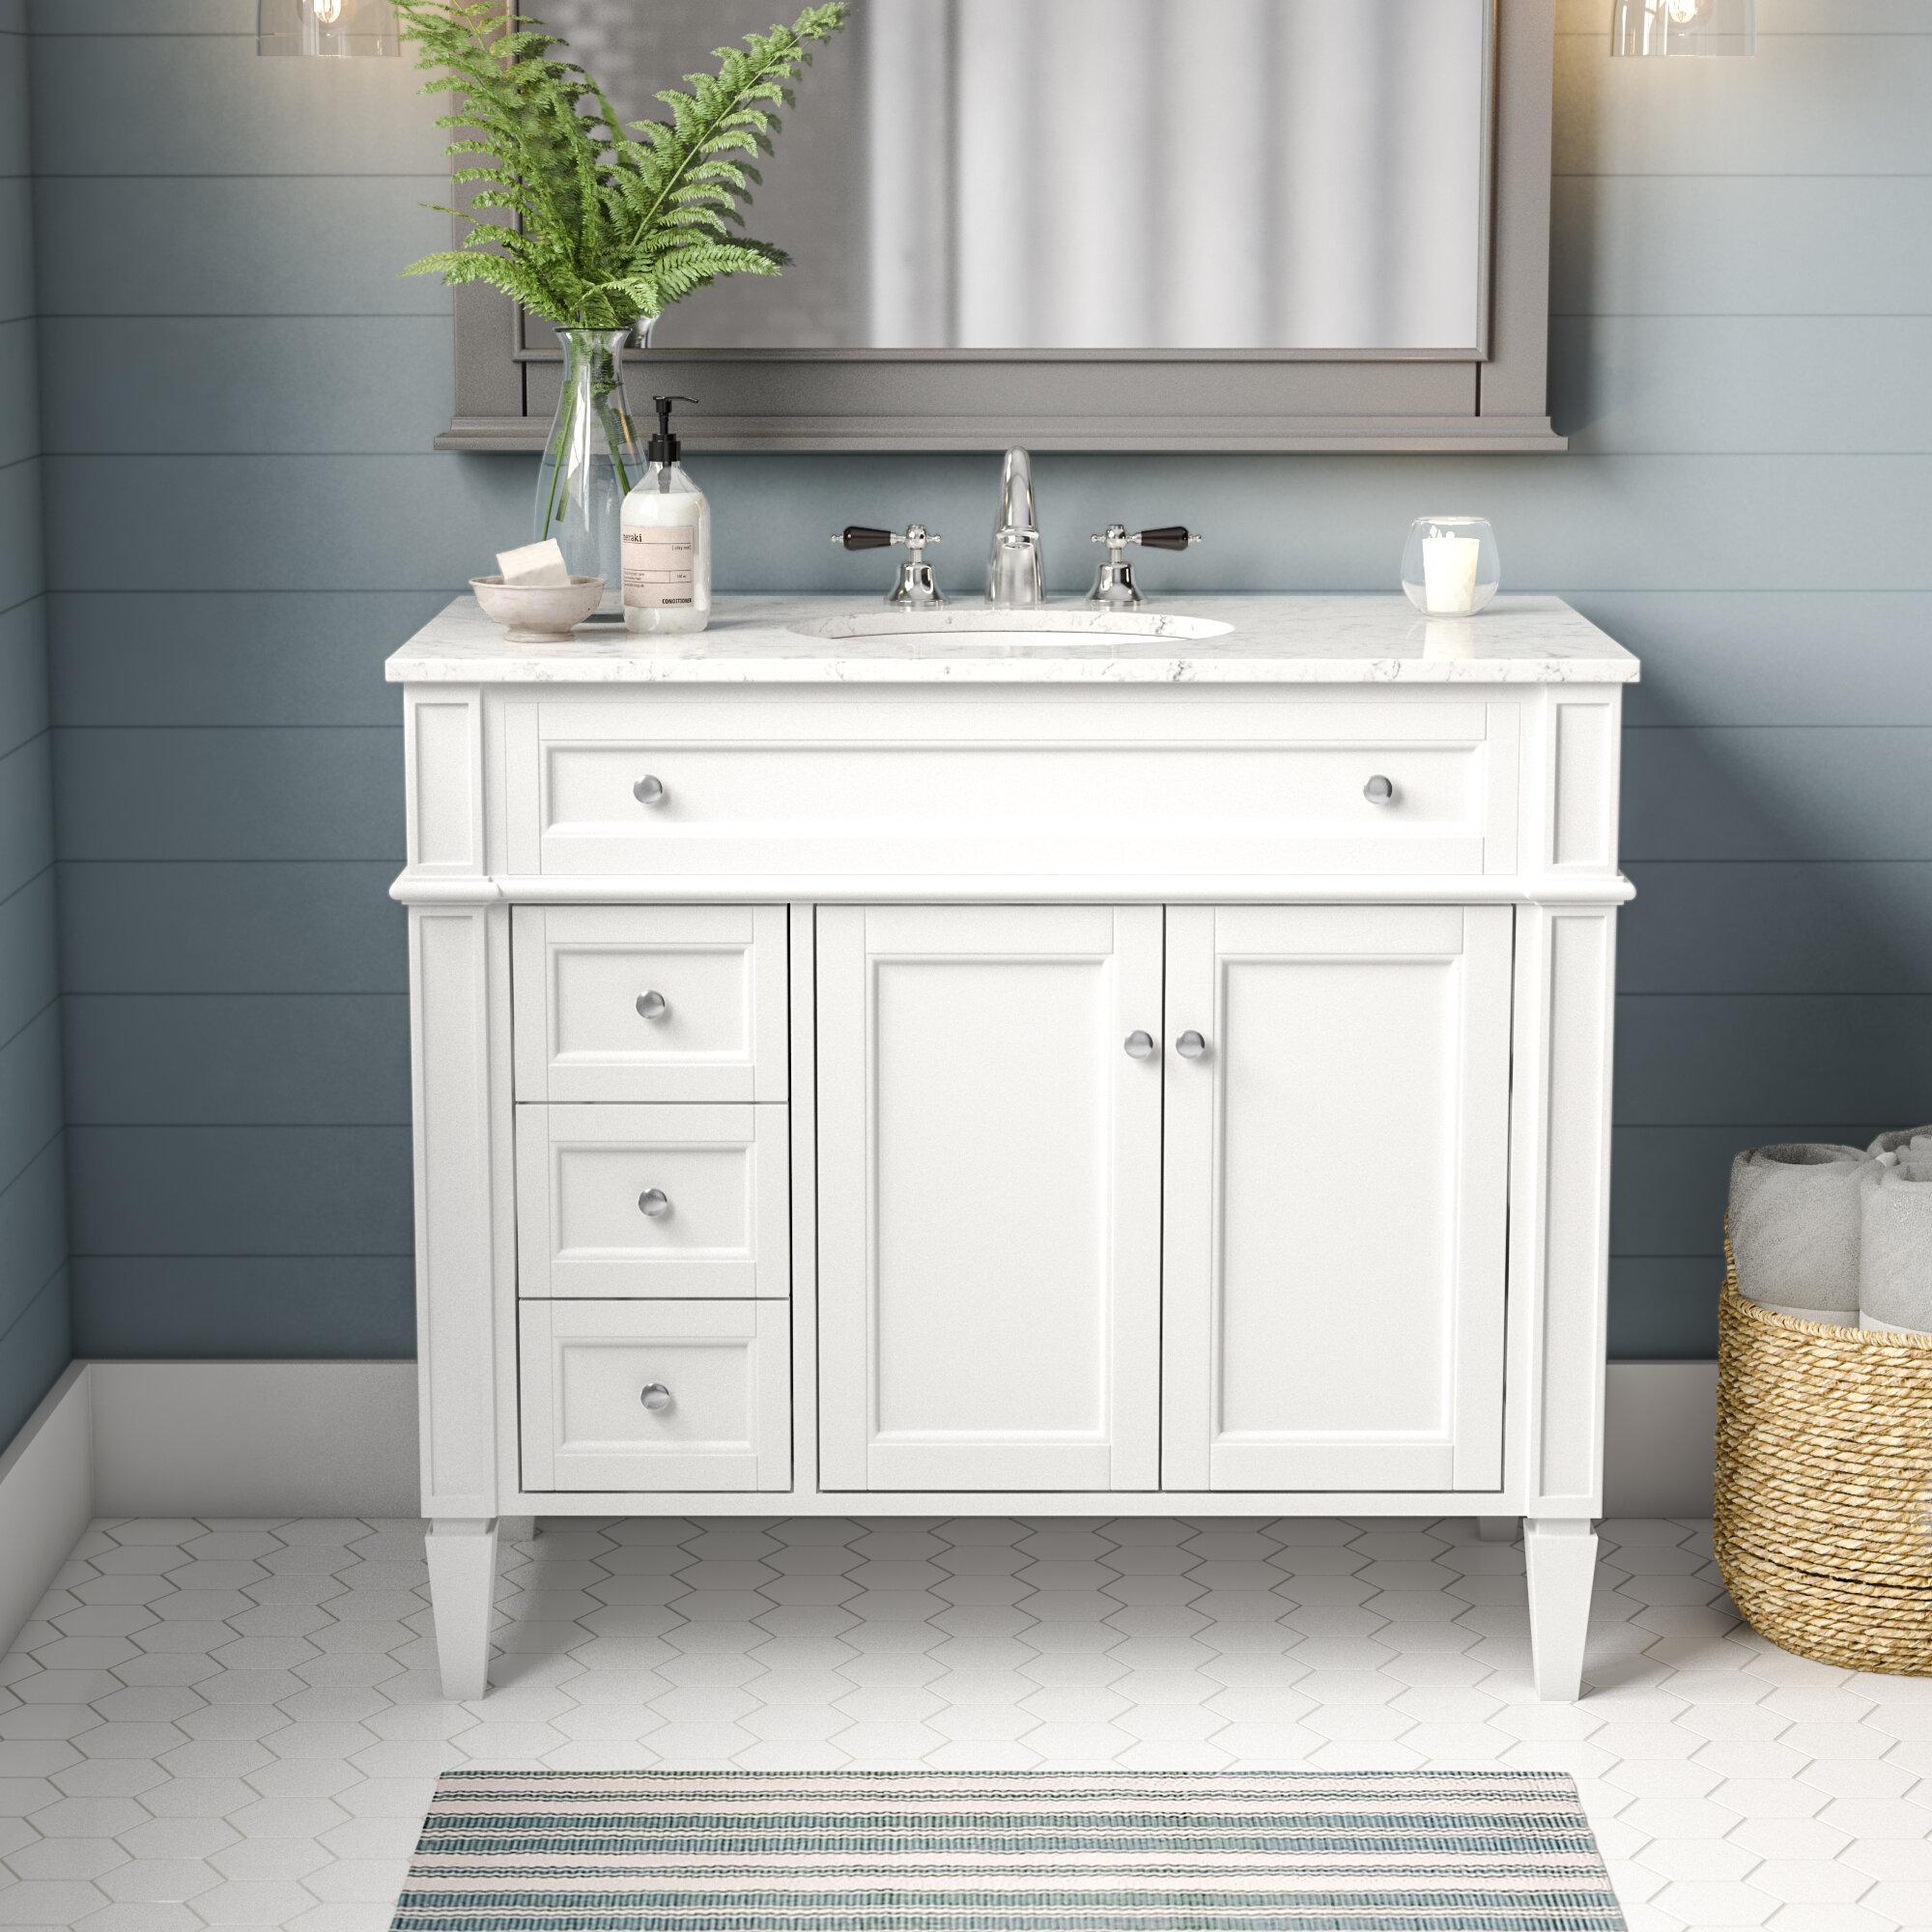 Bathroom Vanities You Ll Love In 2021 Wayfair